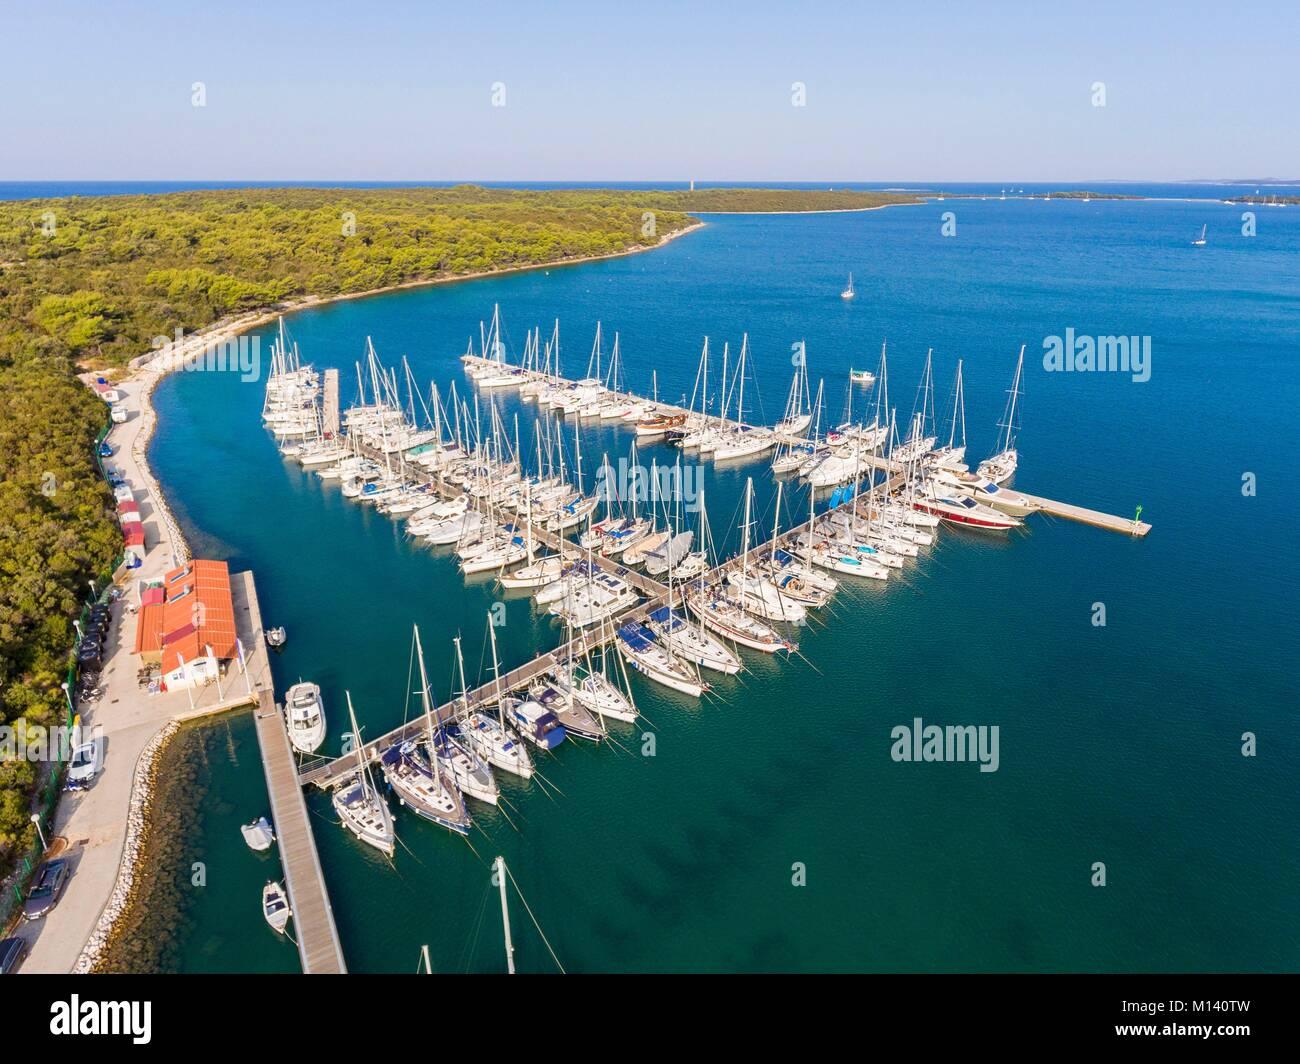 Croazia, Dalmazia Settentrionale, costa dalmata, arcipelago di Zadar, Dugi Otok, Veli Rat marina (vista aerea) Foto Stock